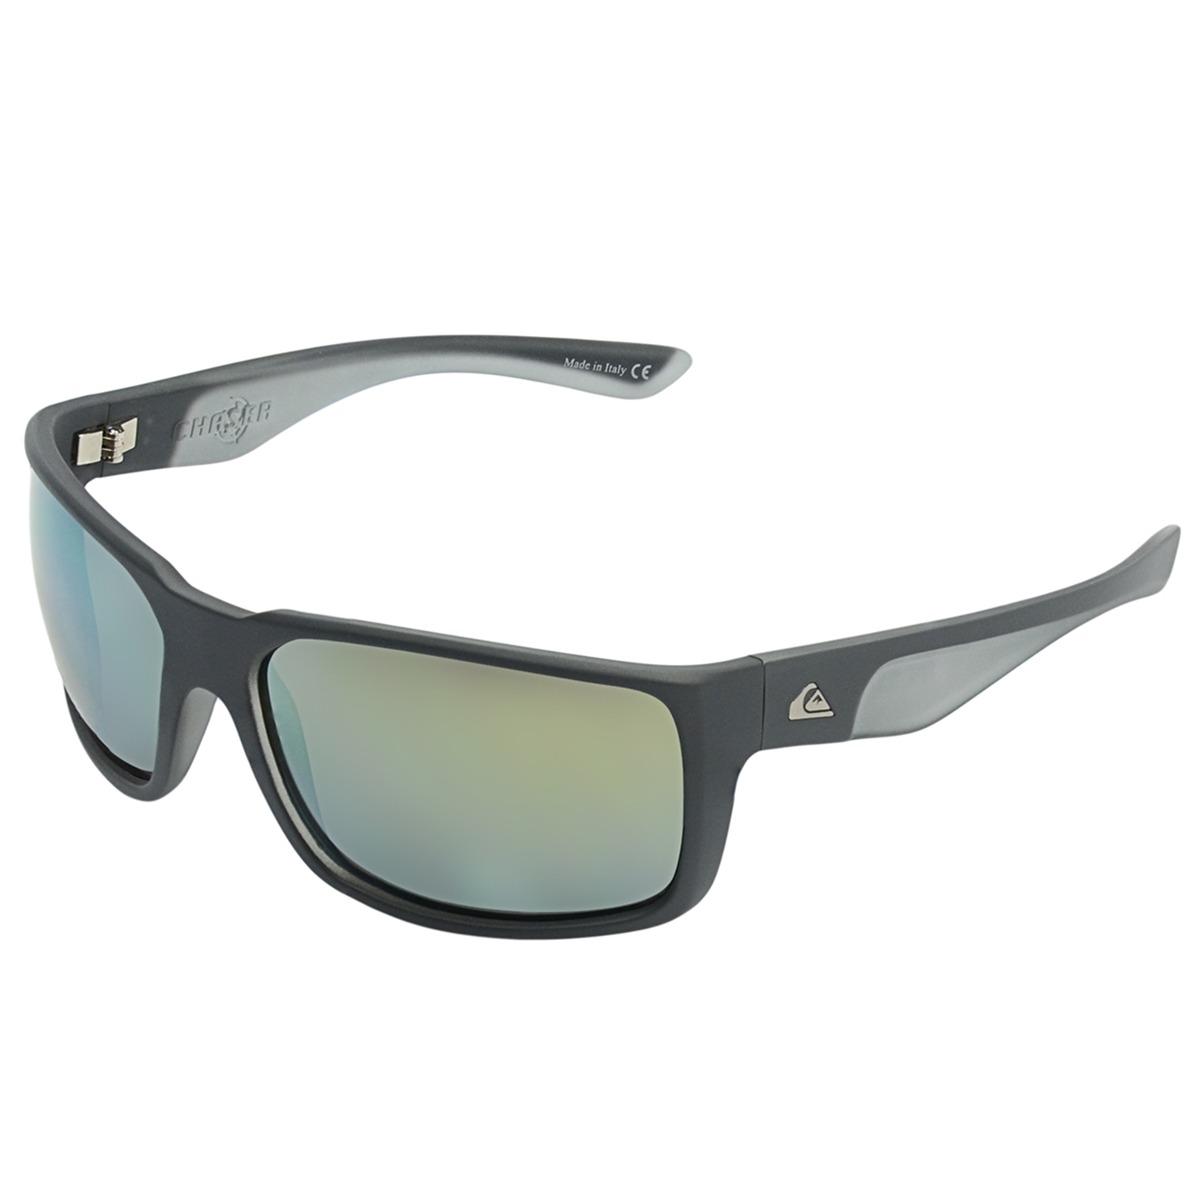 7d5c578f66f87 Óculos Masculino Quiksilver Chaser Matte Grey - R  480,00 em Mercado ...